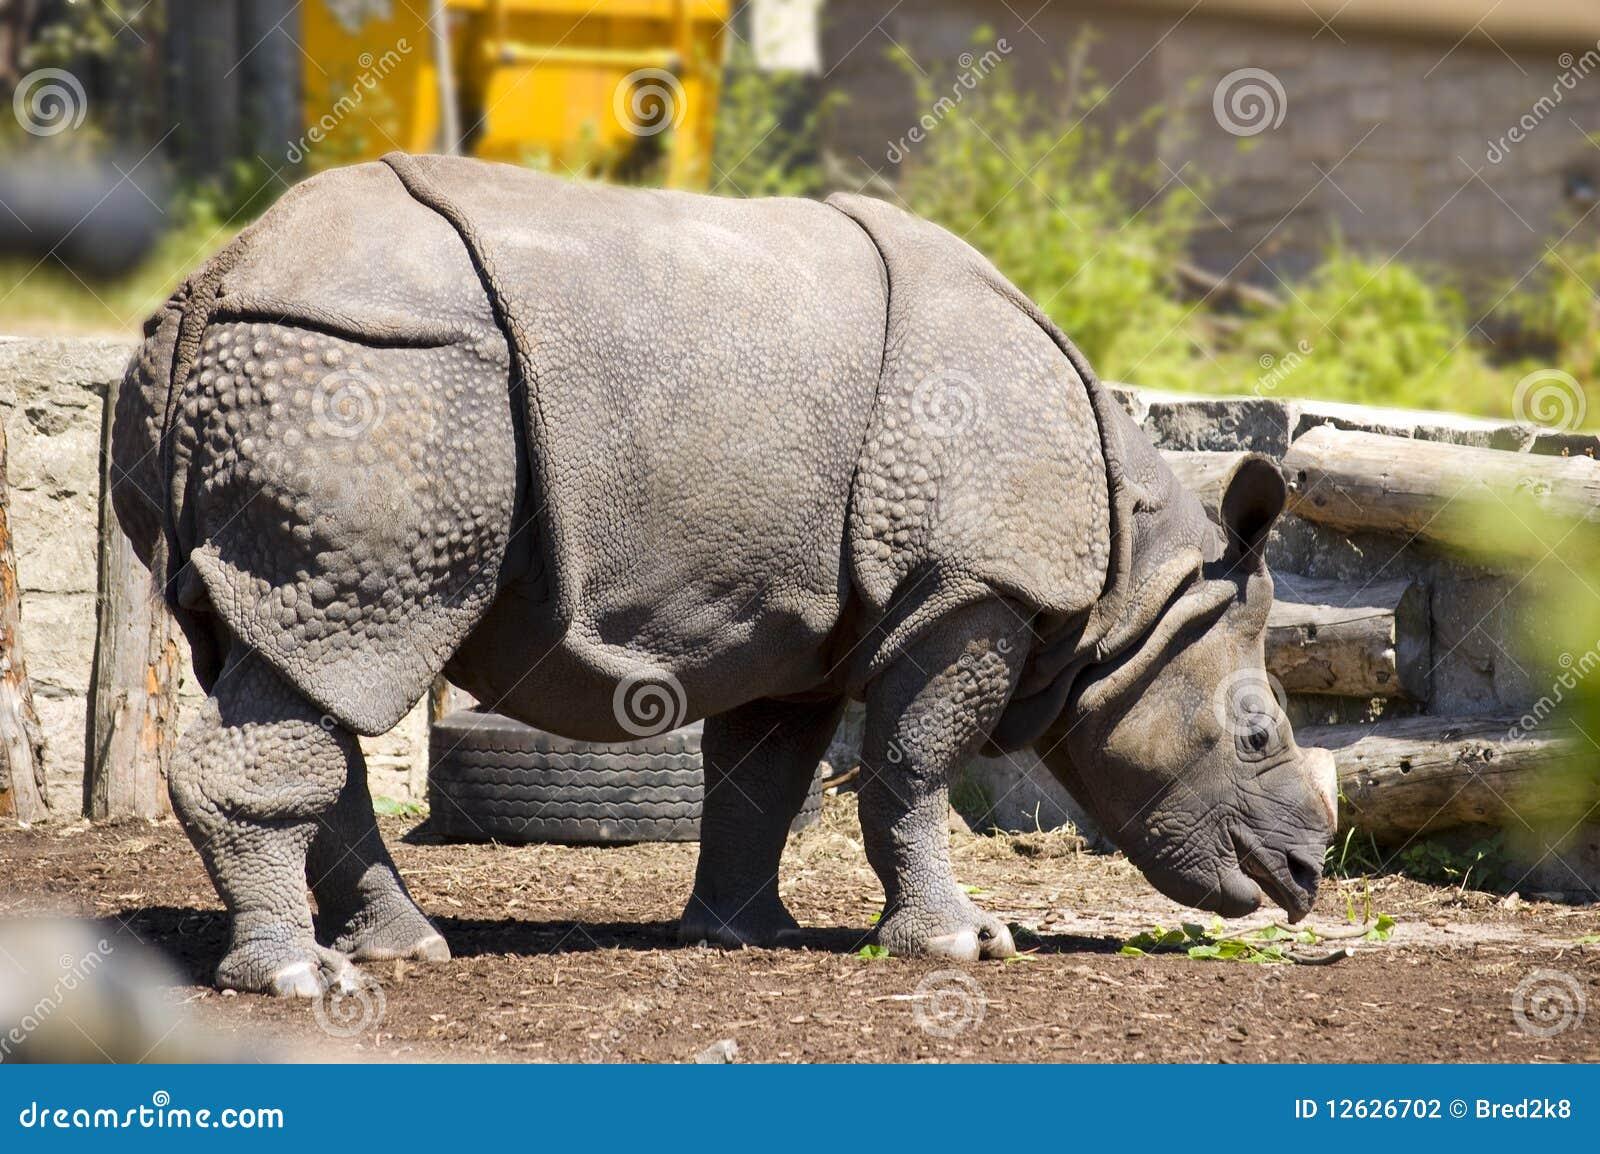 Download Indonesian Rhinoceros/Great One Horned Rhinoceros Stock Photo - Image of zoopark, edinburgh: 12626702